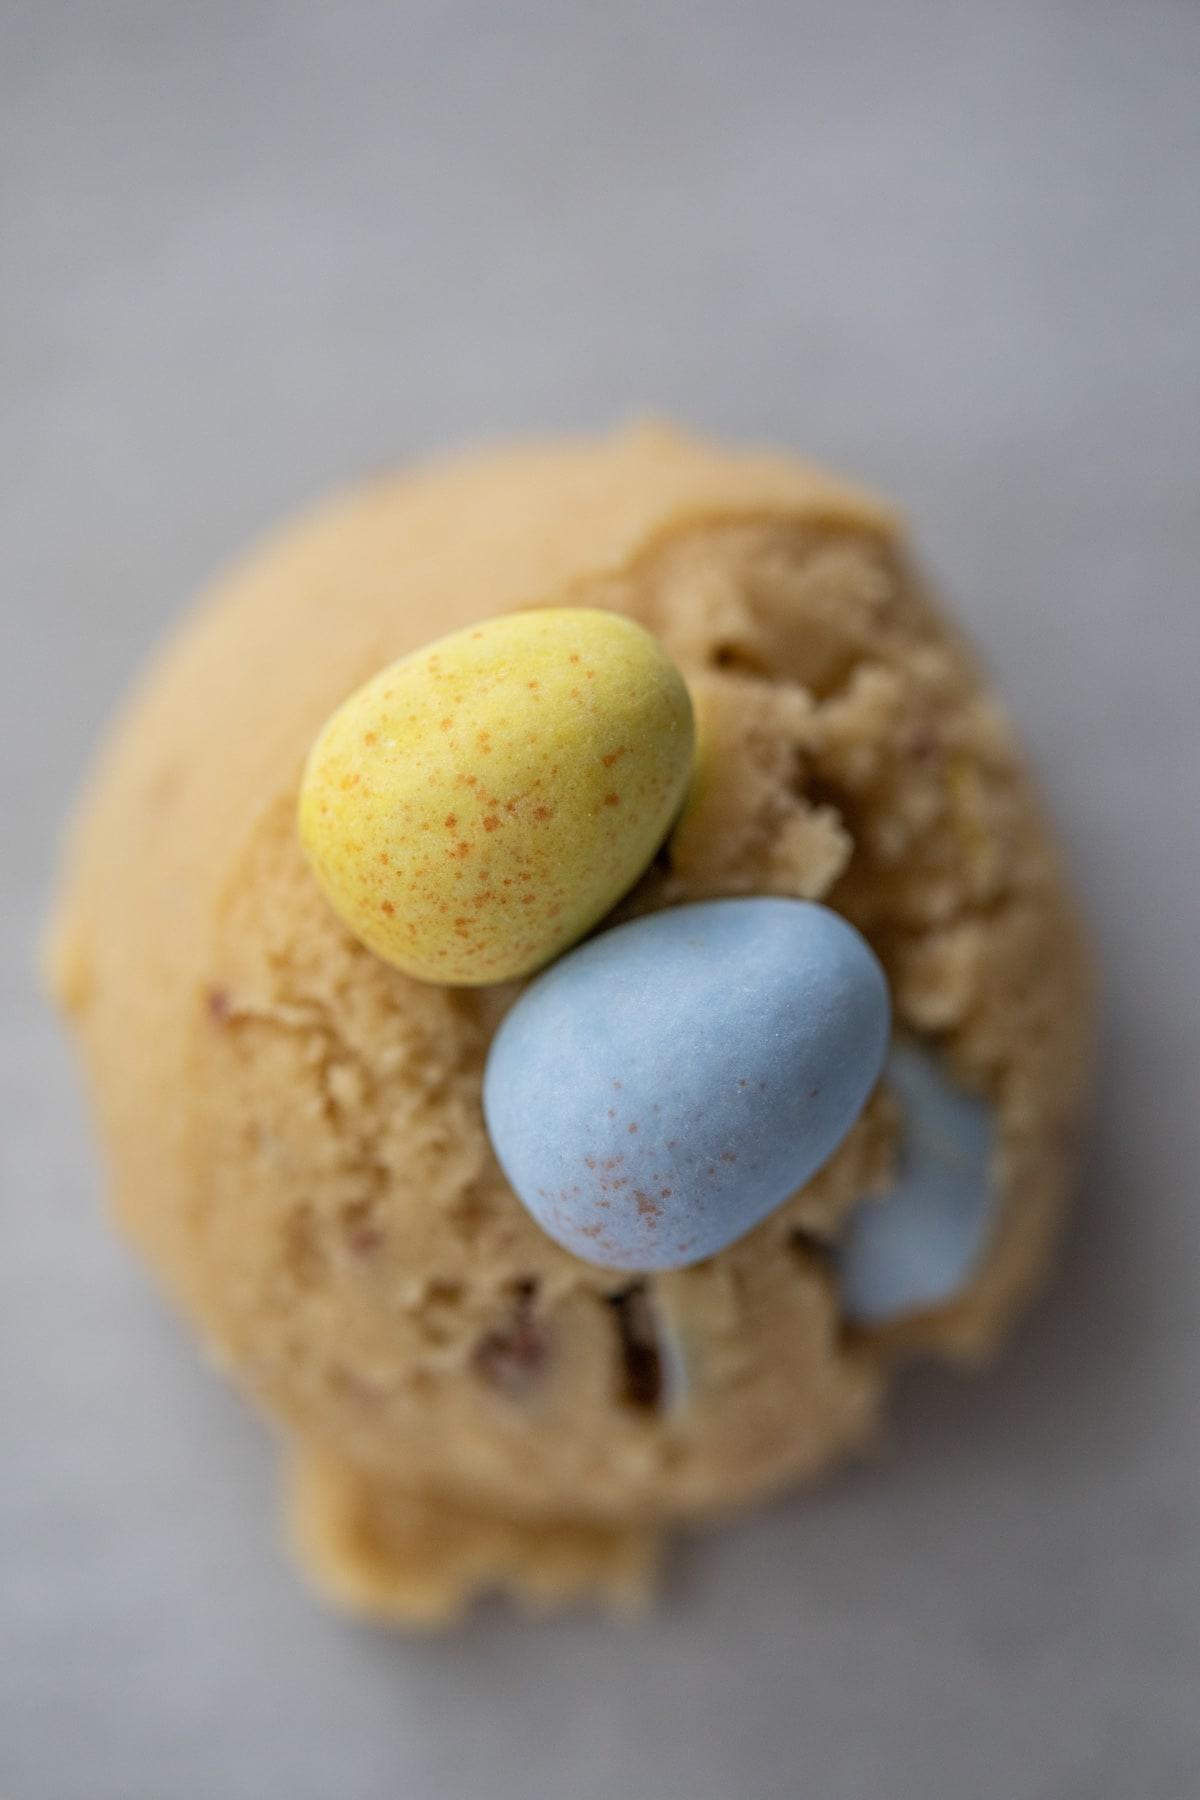 cadbury eggs pressed into cookie dough